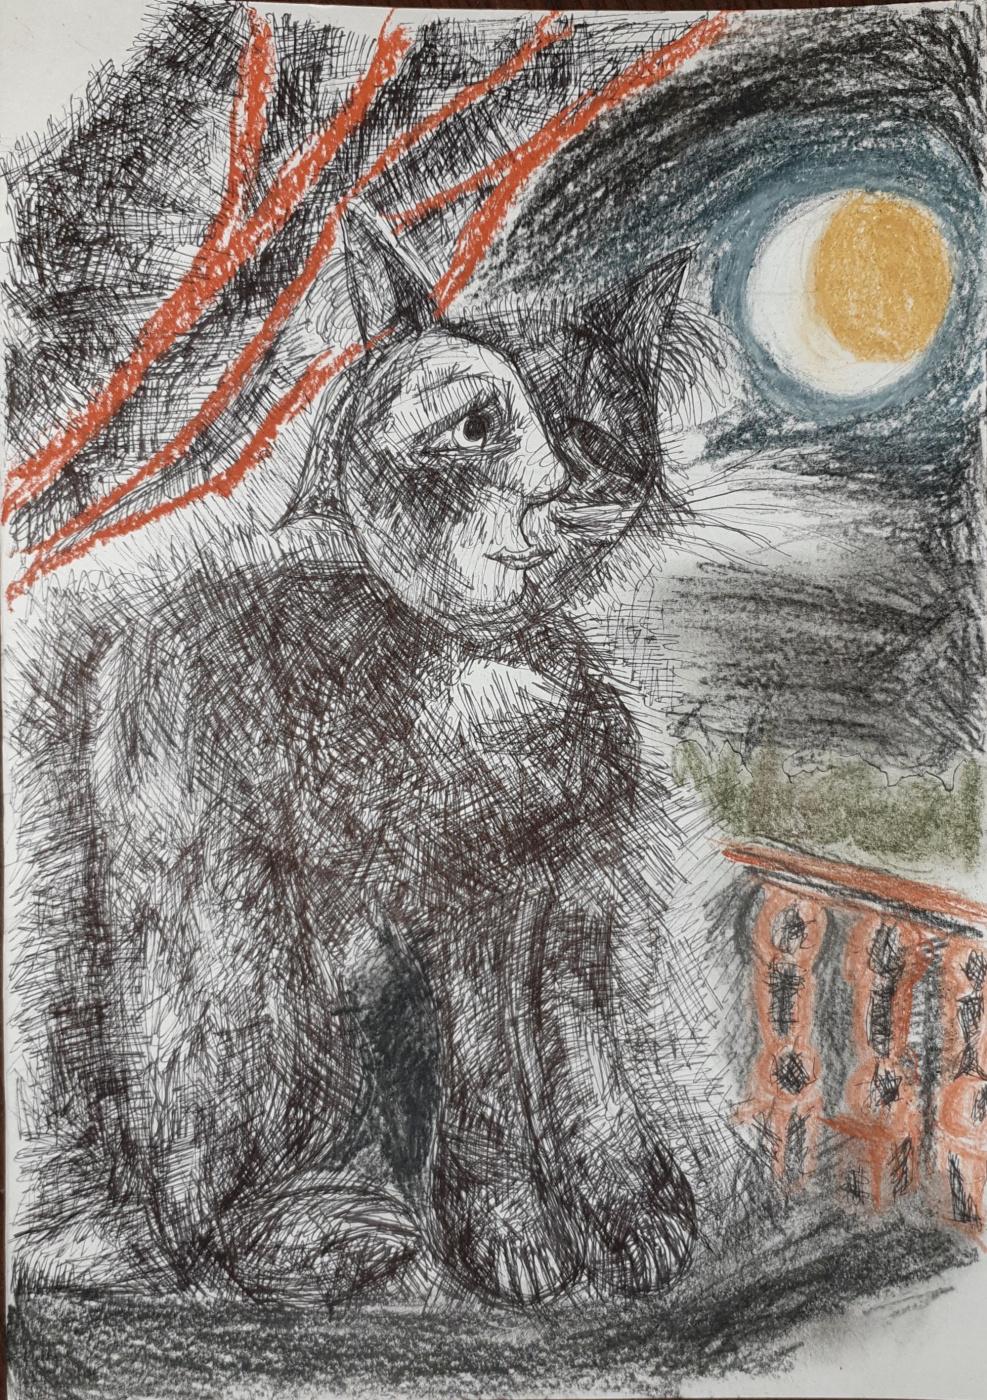 Руслан Шакиров. Cat